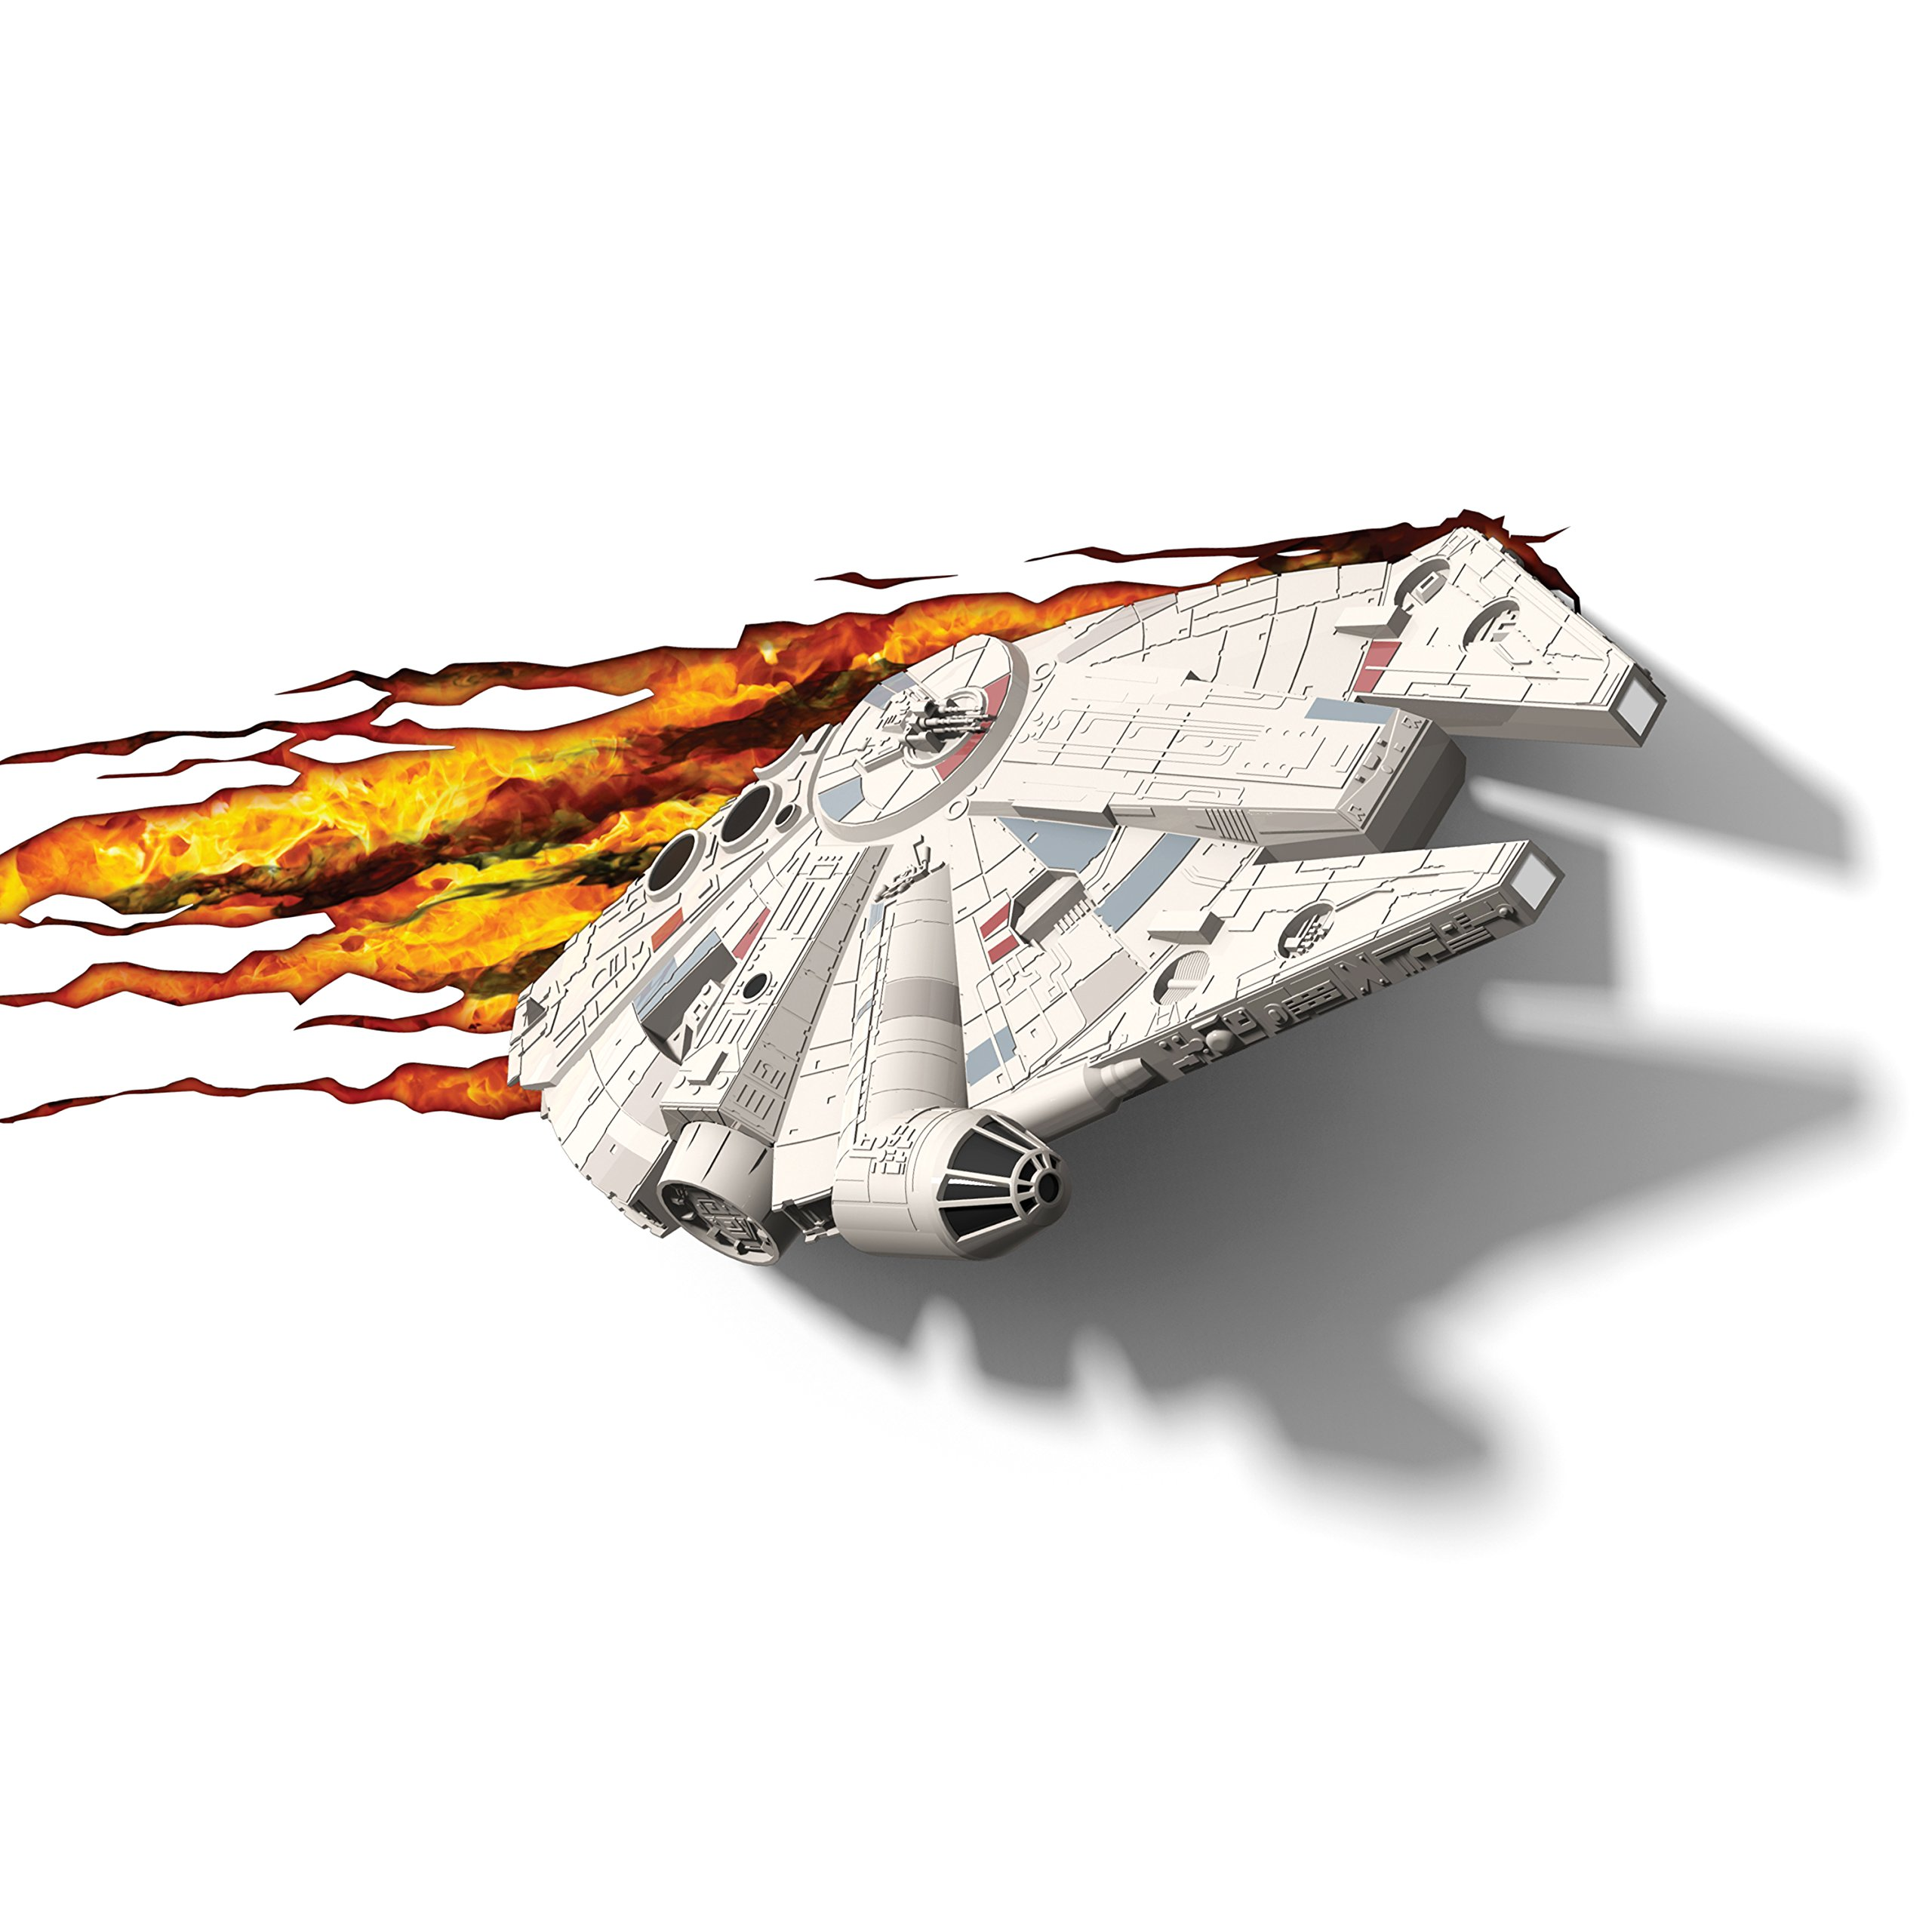 3DLightFX Star Wars Millennium Falcon 3D Deco Light by 3D light FX (Image #1)